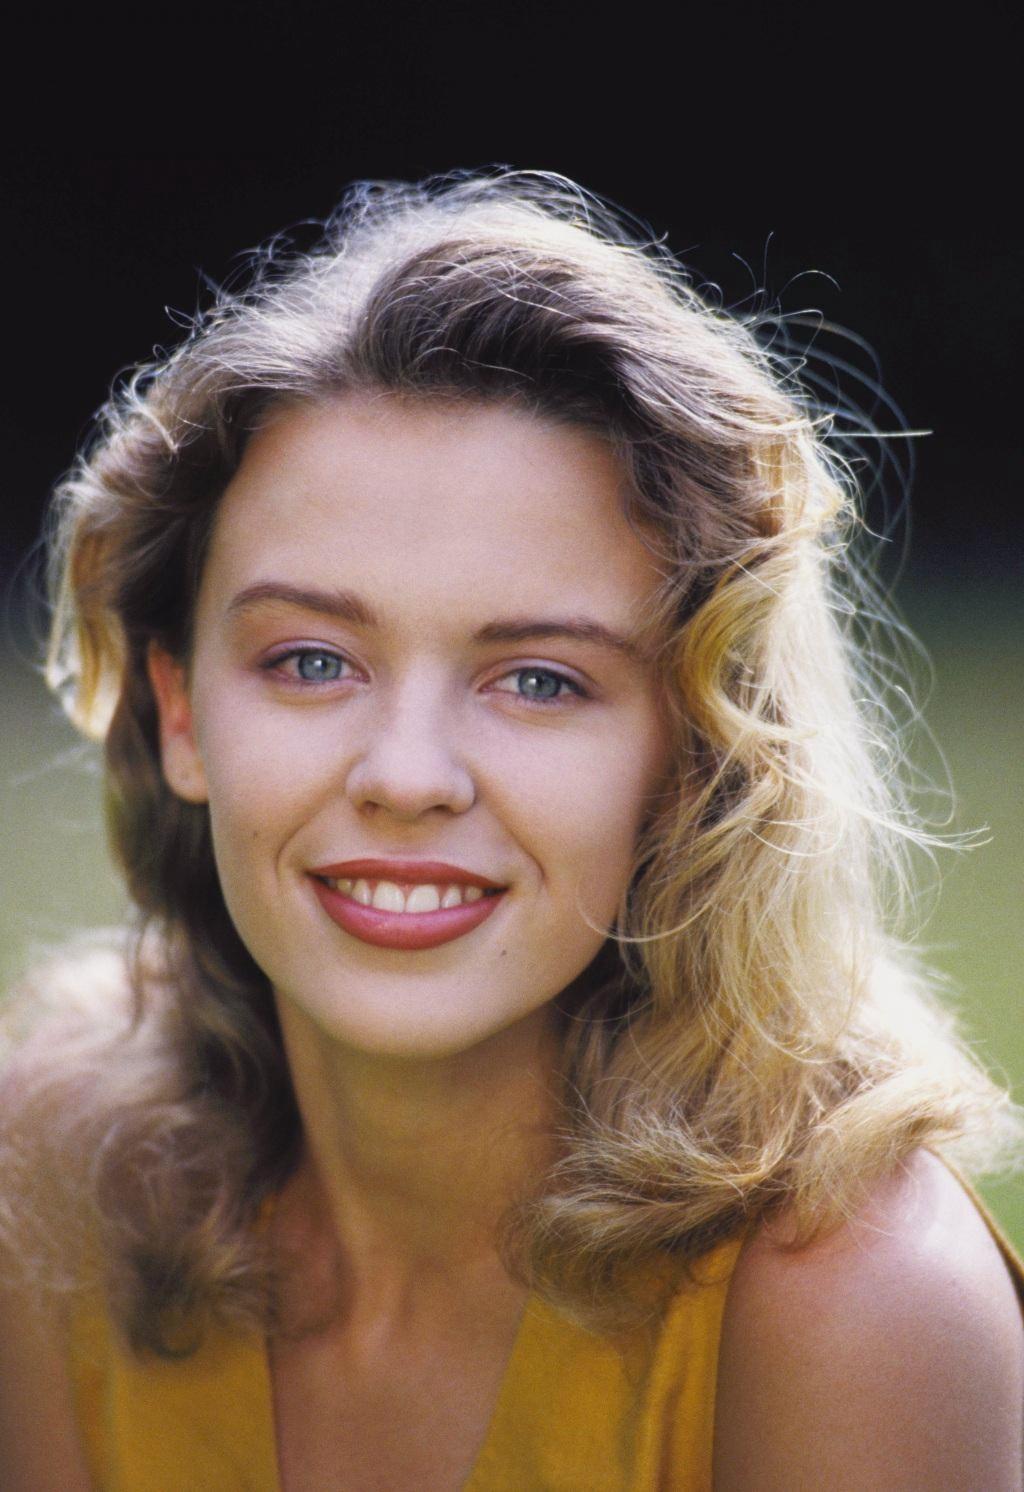 Full Hd Wallpapers 1080p Desktop Free Download Kylie Minogue Wallpaper Hd Download